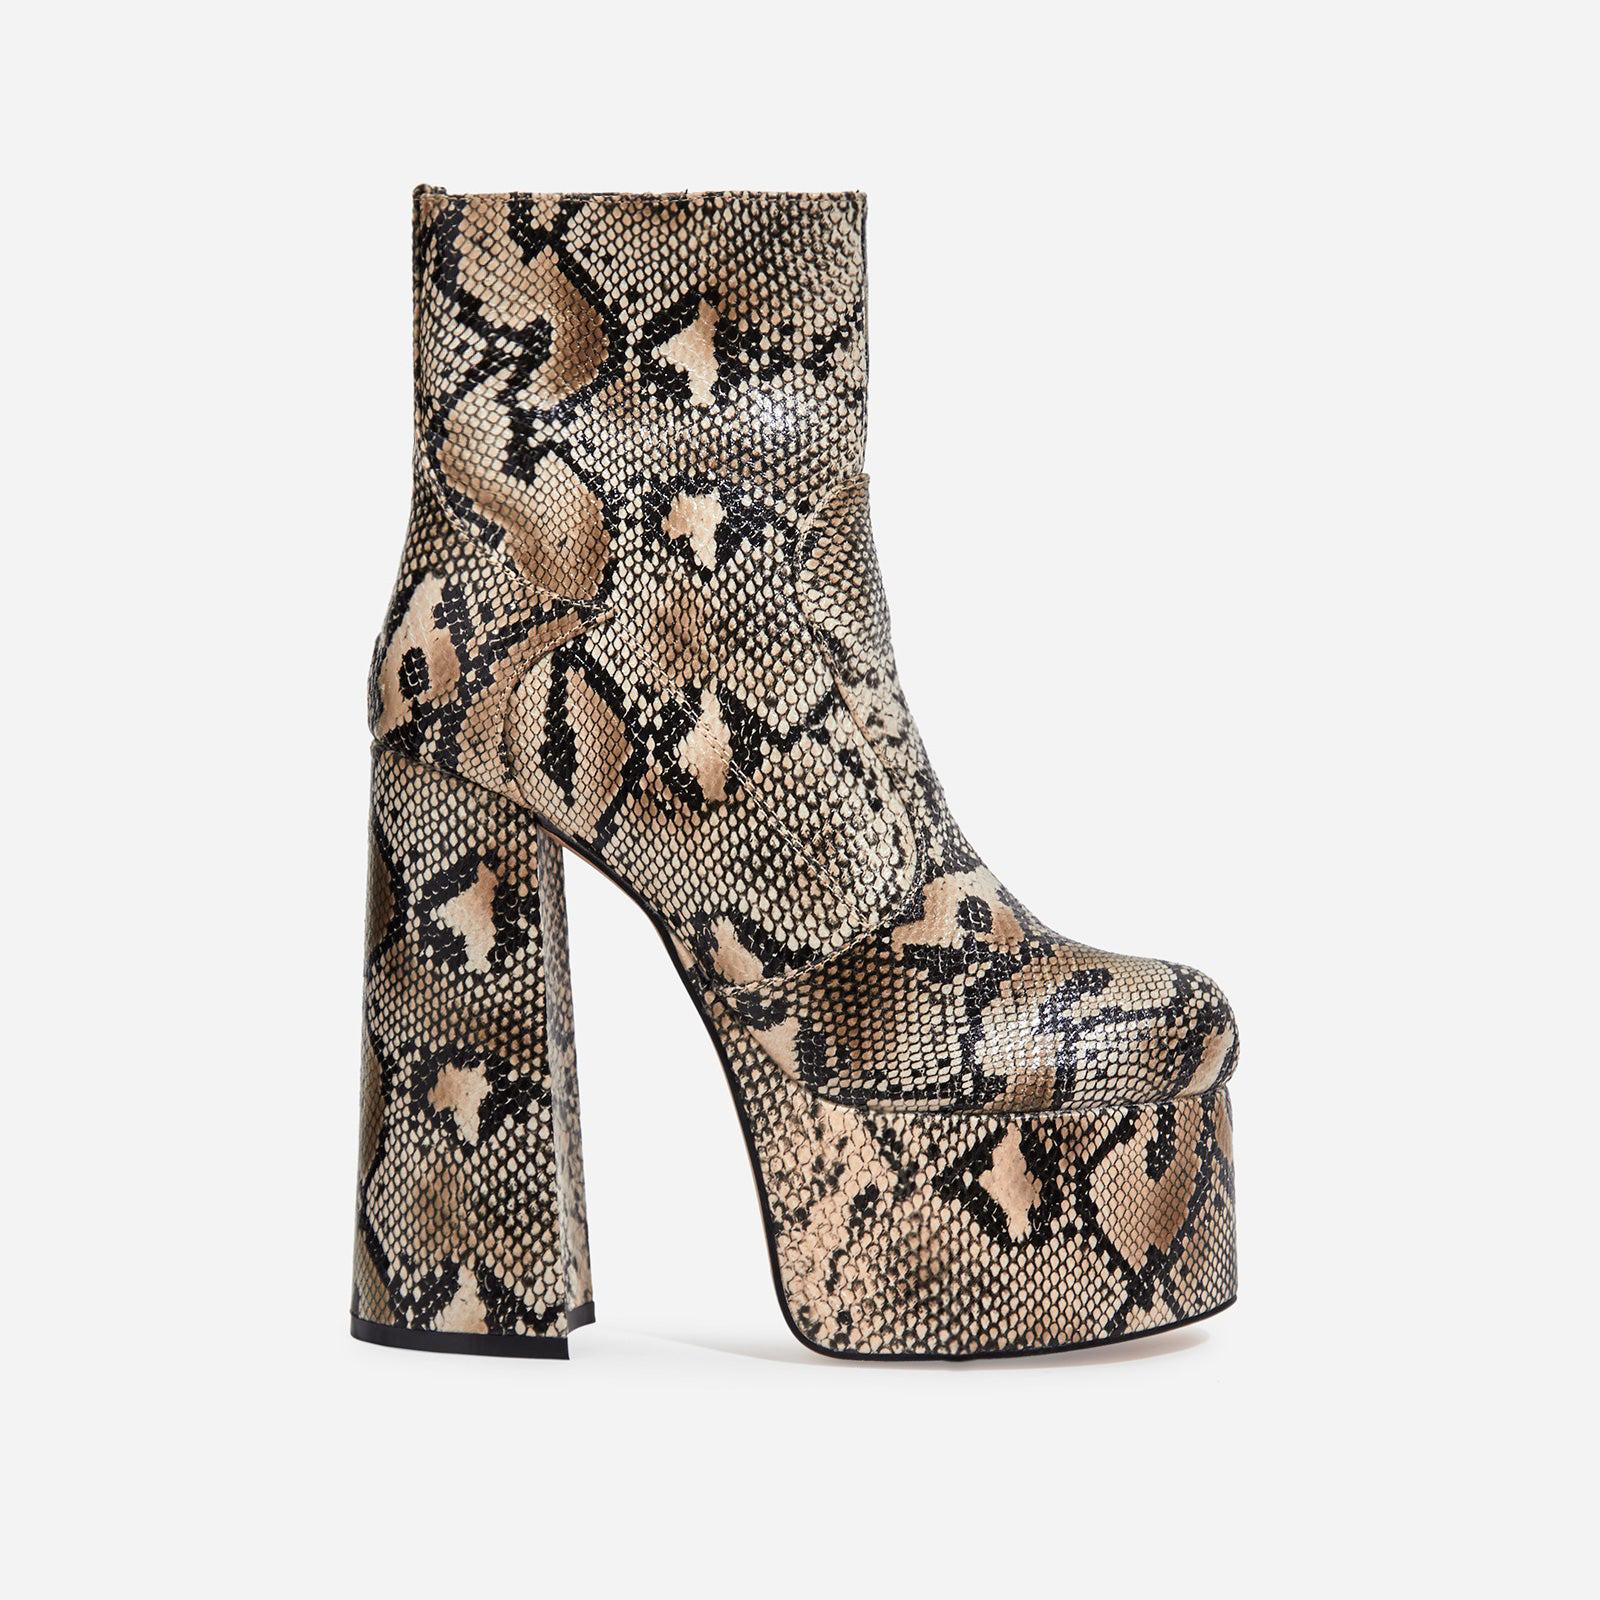 Steal Platform Block Heel Ankle Boot In Nude Snake Print Faux Suede